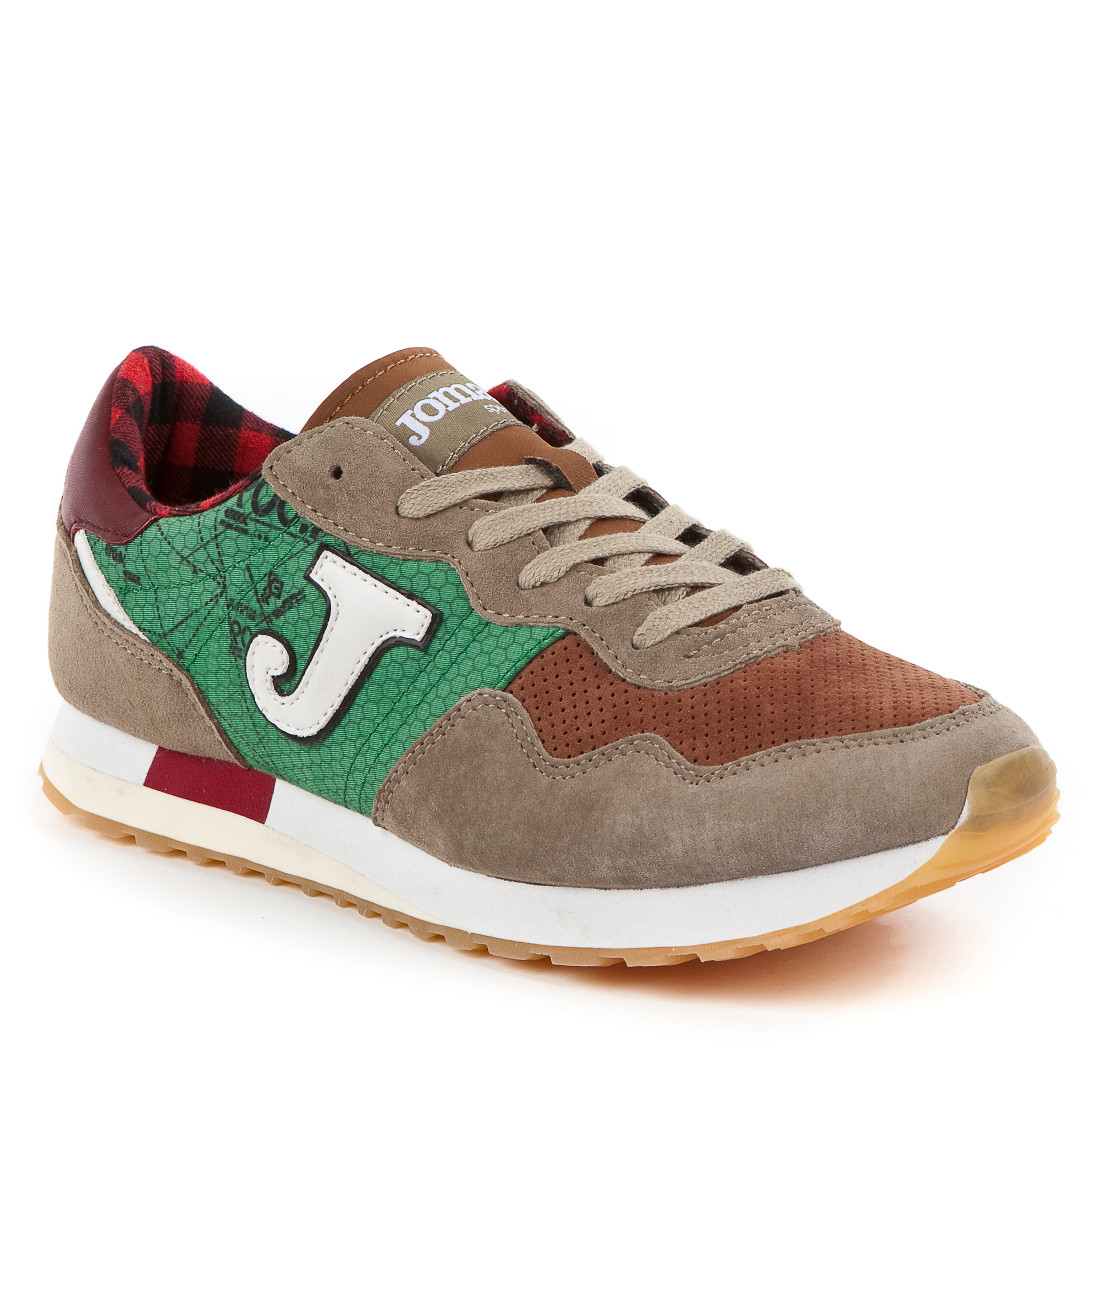 Joma Scarpe Sneakers Sportive Ginnastica Saucony jazz style Uomo Beige